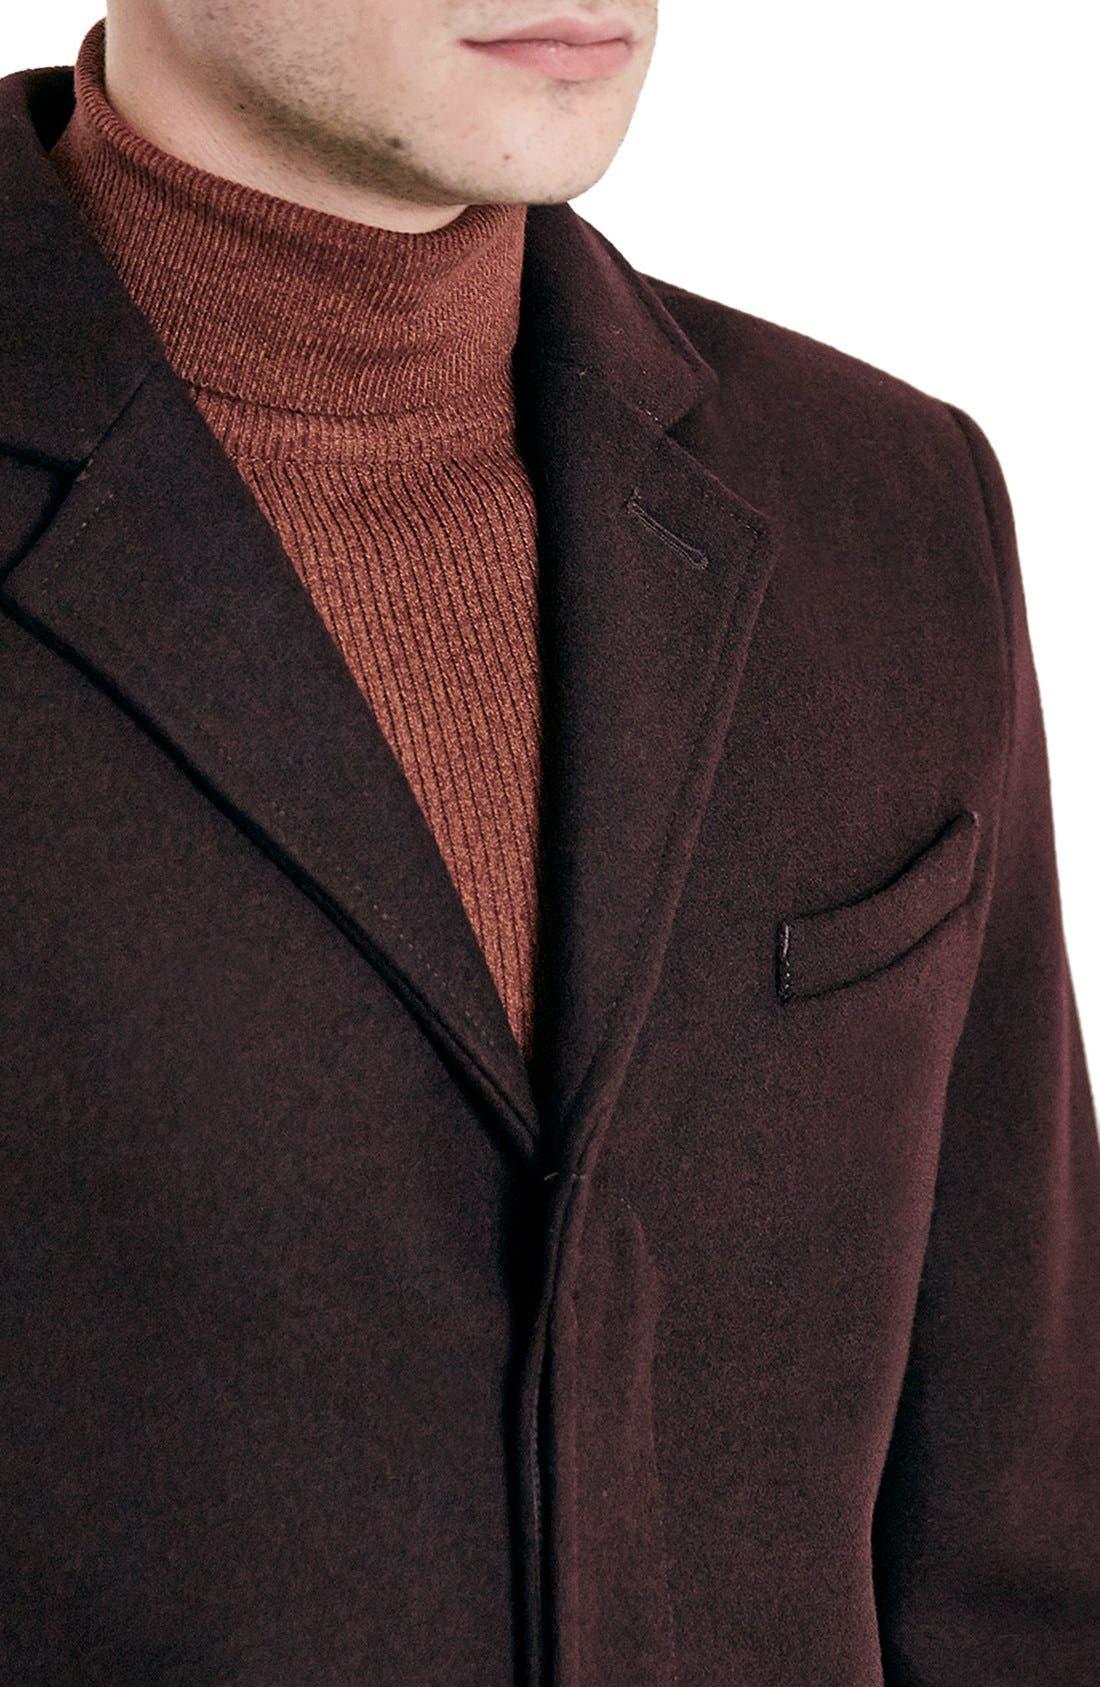 Burgundy Topcoat,                             Alternate thumbnail 2, color,                             930